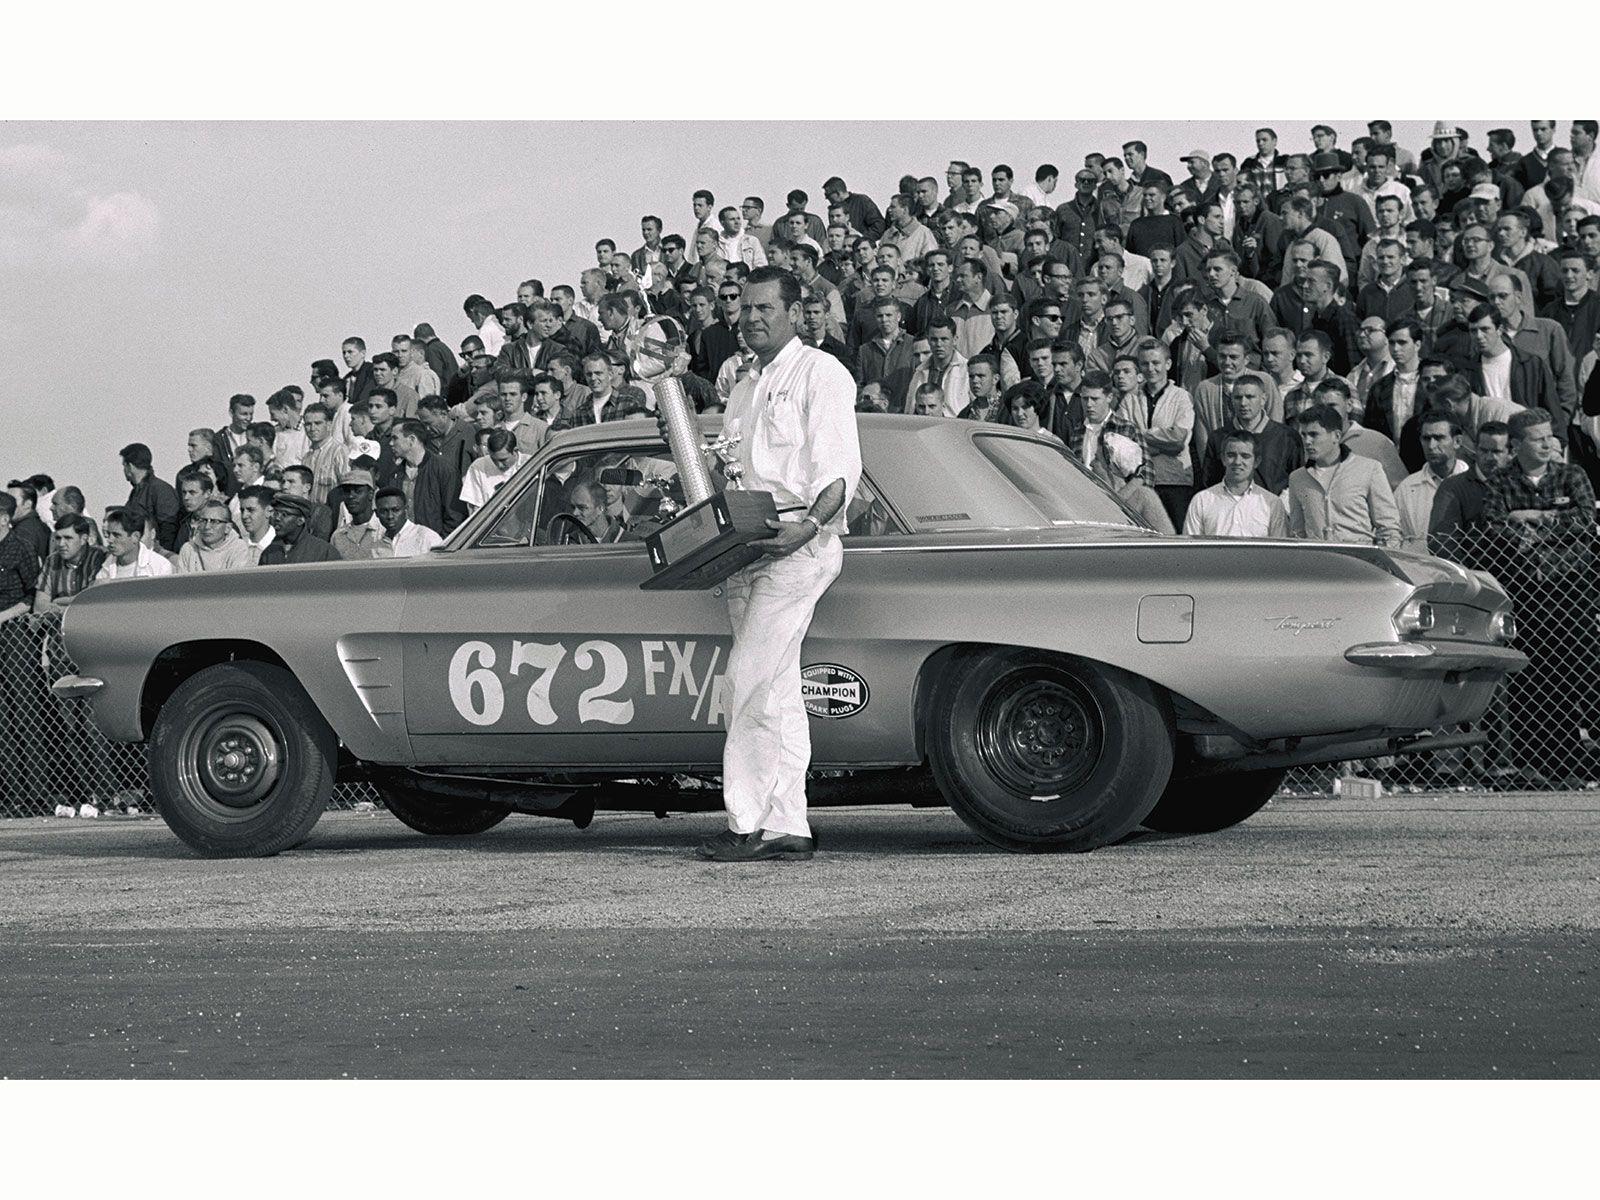 Mickey Thompson 421 Super Duty Tempest Photo 20 1963 Pontiac